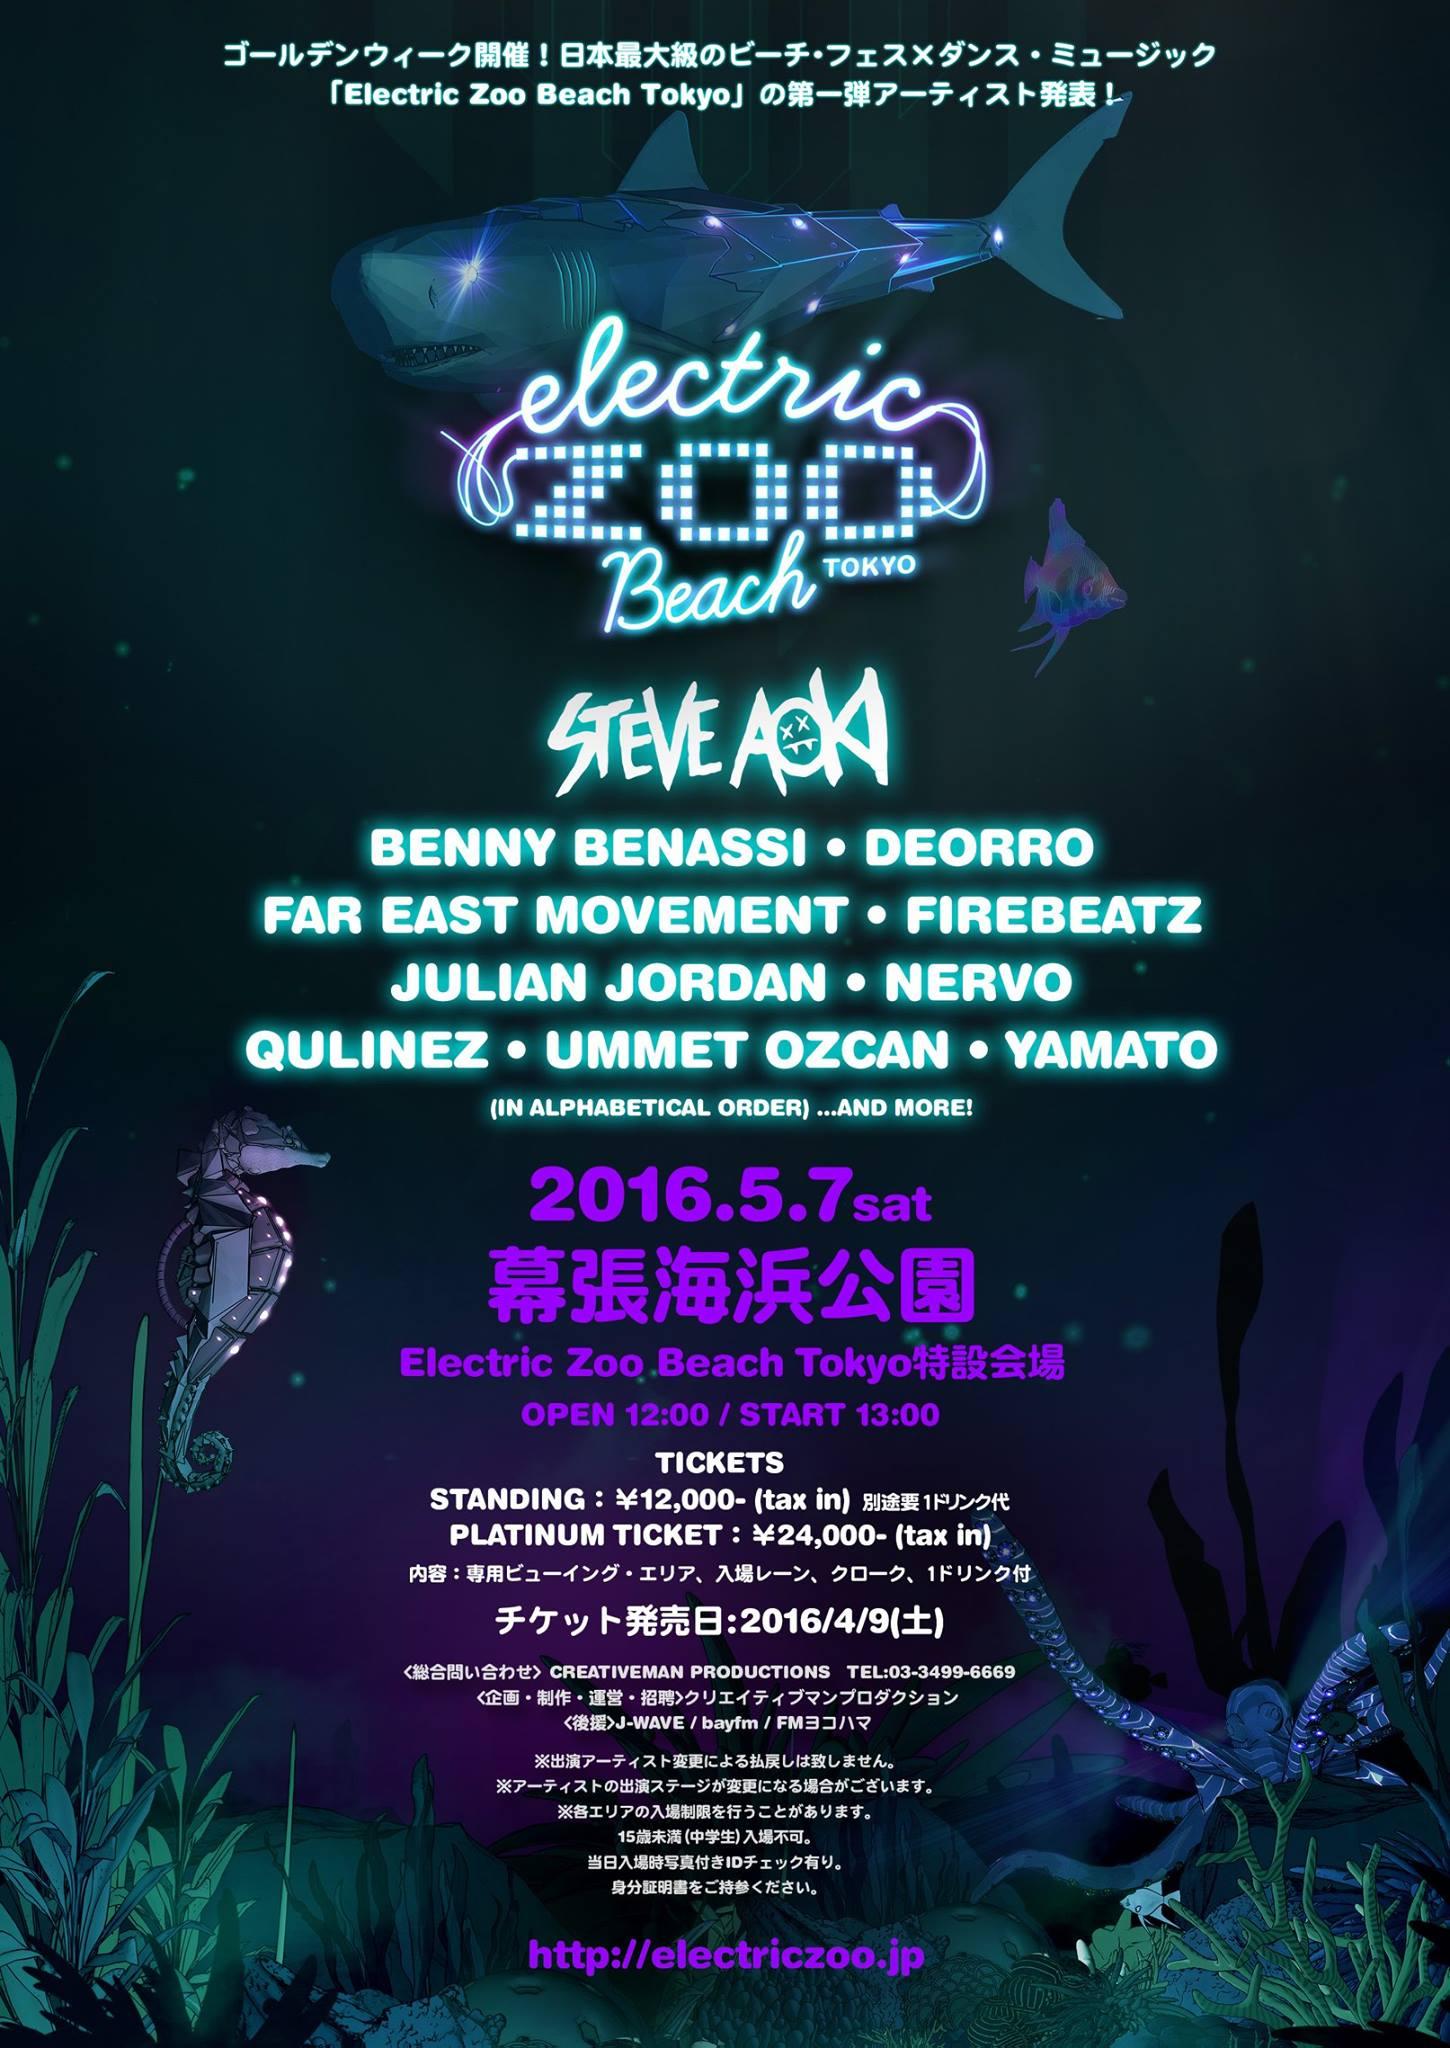 Electric Zoo Beach Tokyo 2016 2